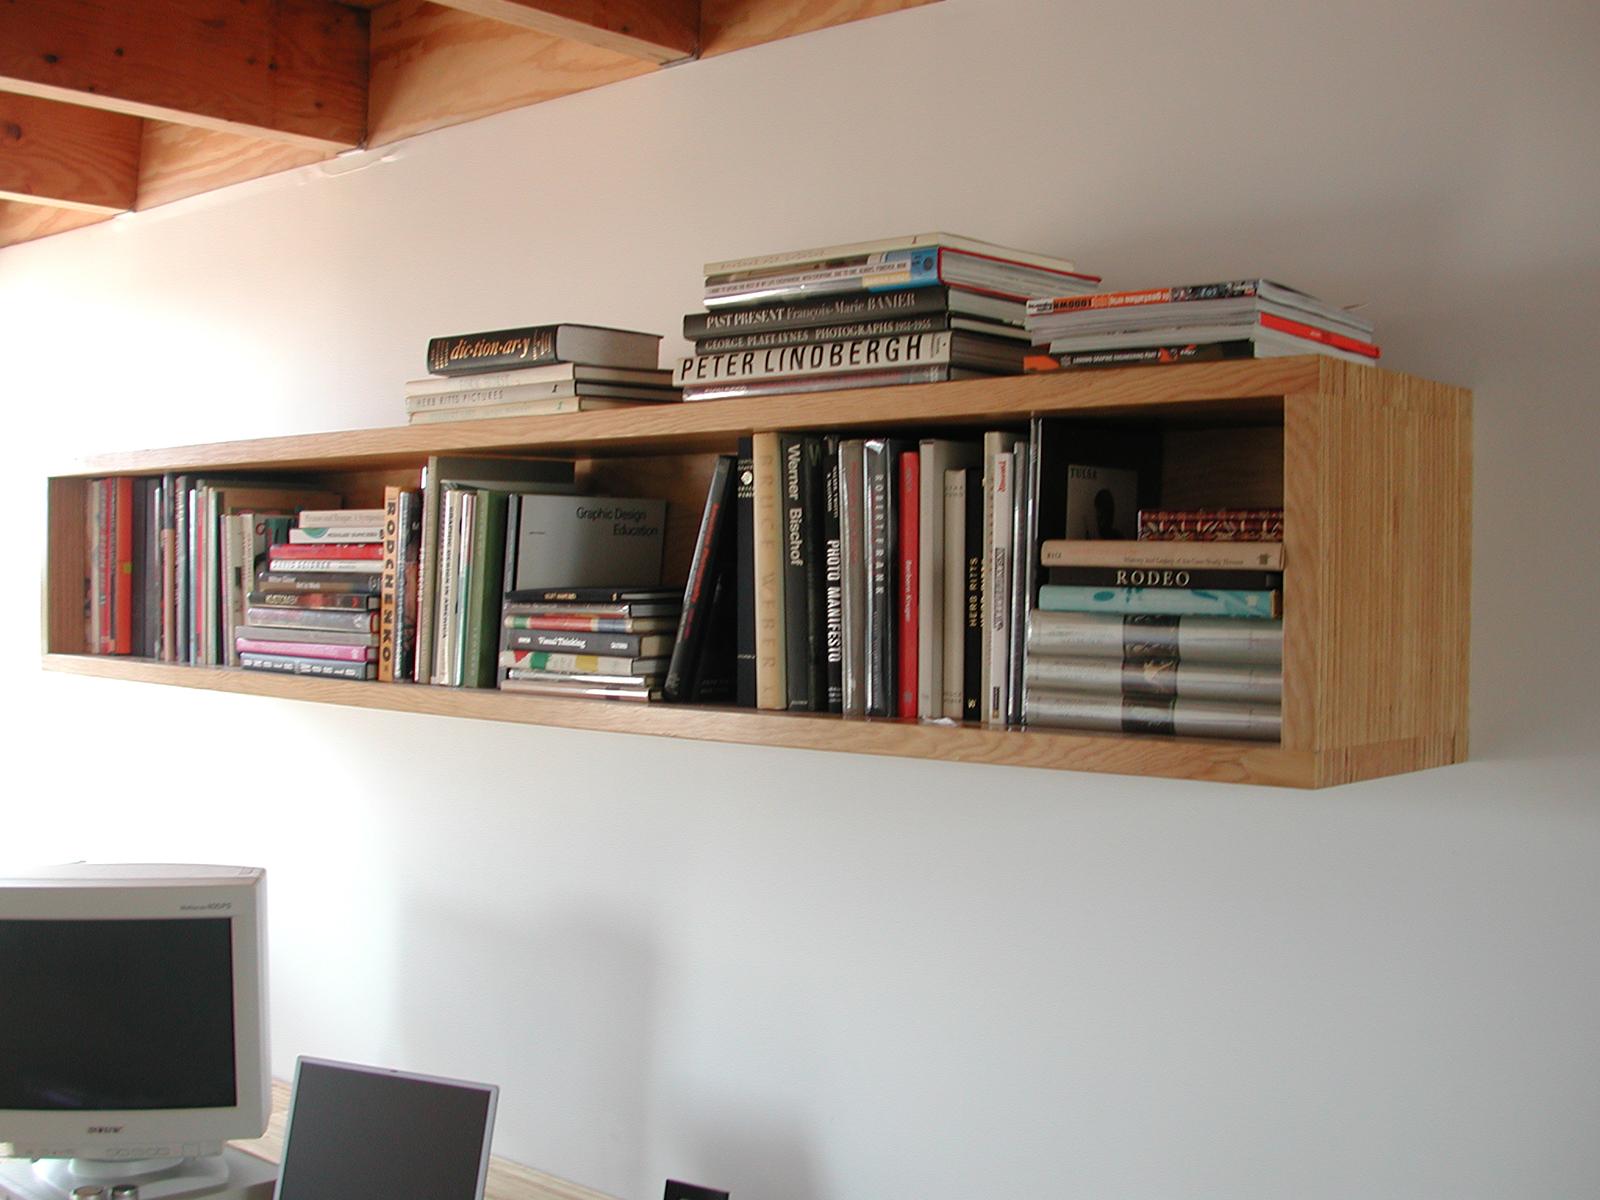 The wall-mounted bookshelf.